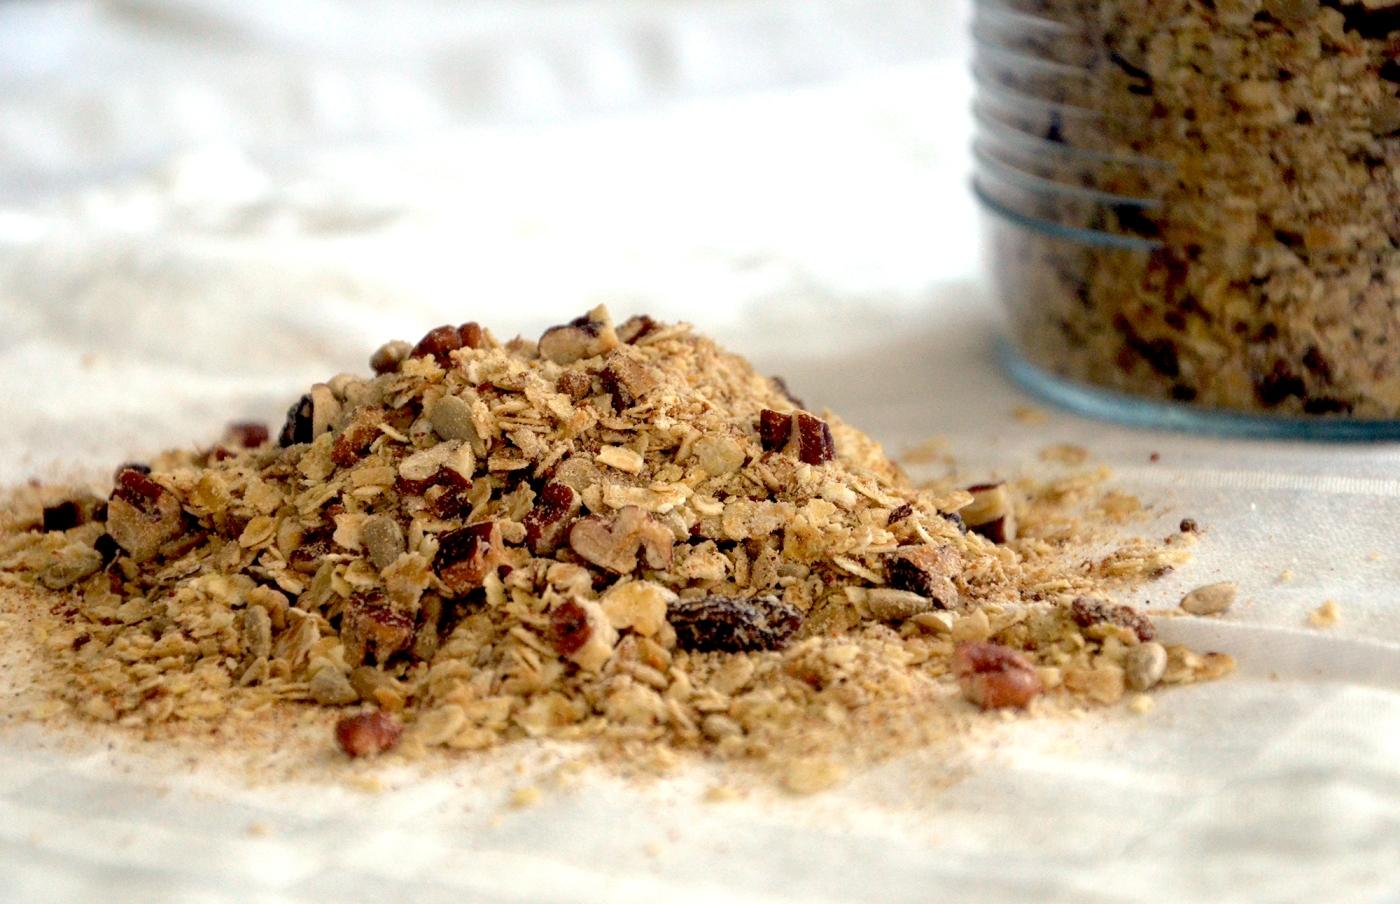 Terveellinen herkkugranola (gluteeniton, low FODMAP) - Healthy Glutenfree Granola / Sweets by Sini